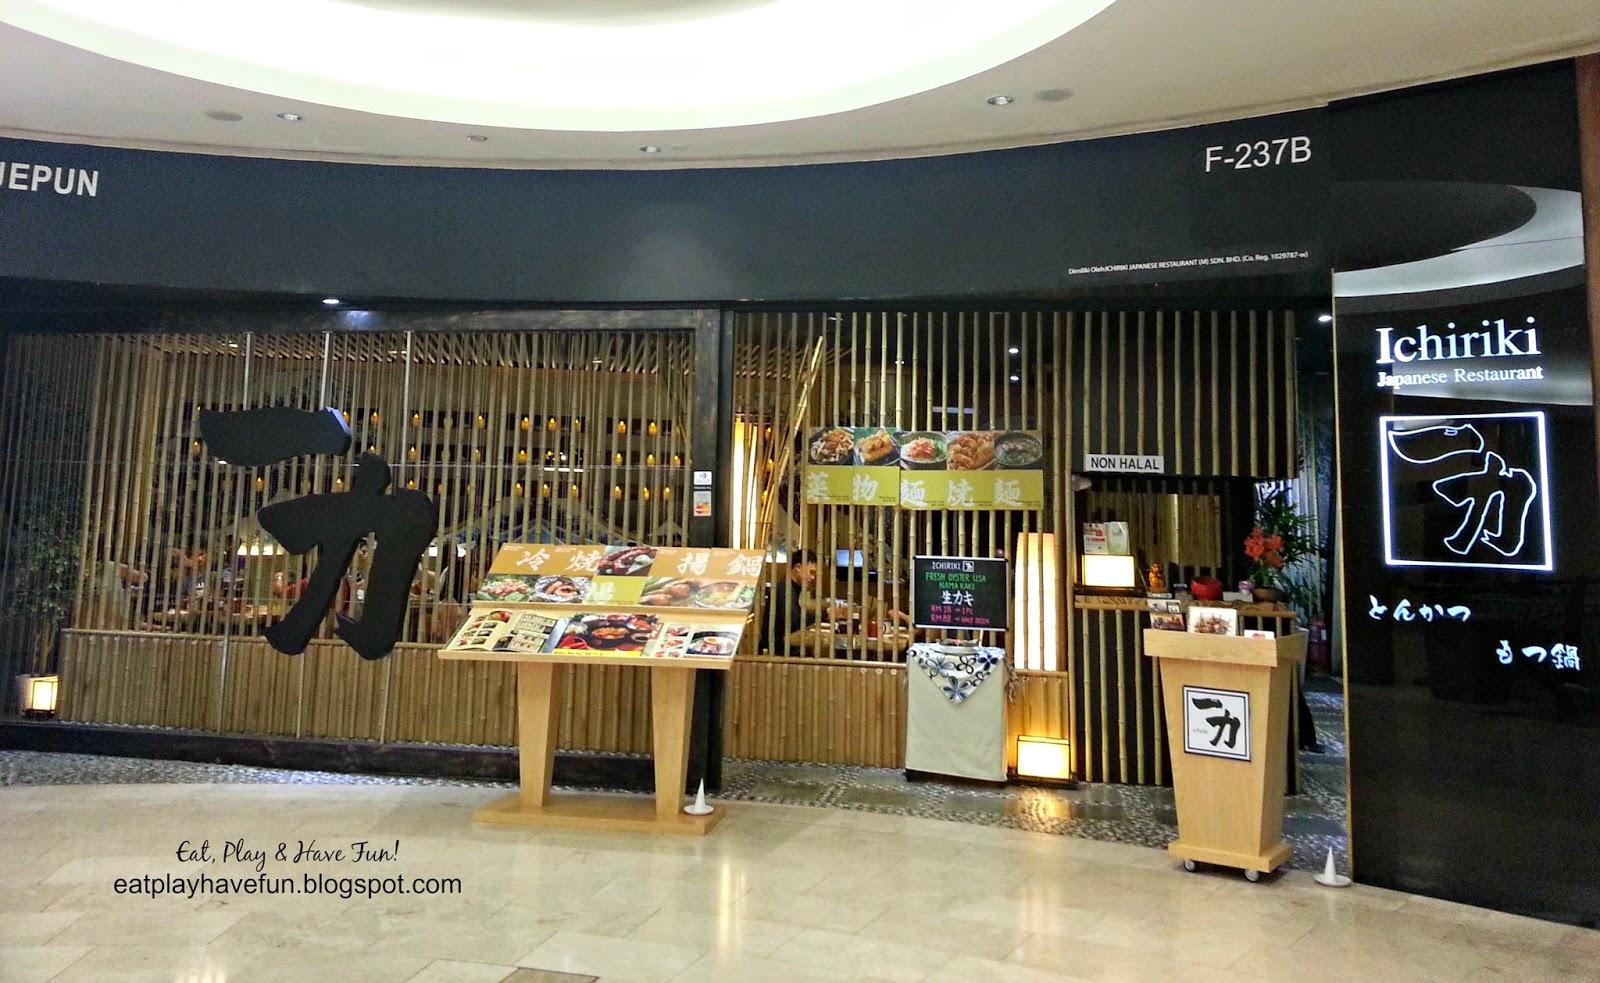 Eat, Play & Have Fun!: Ichiriki @ The Gardens Mall